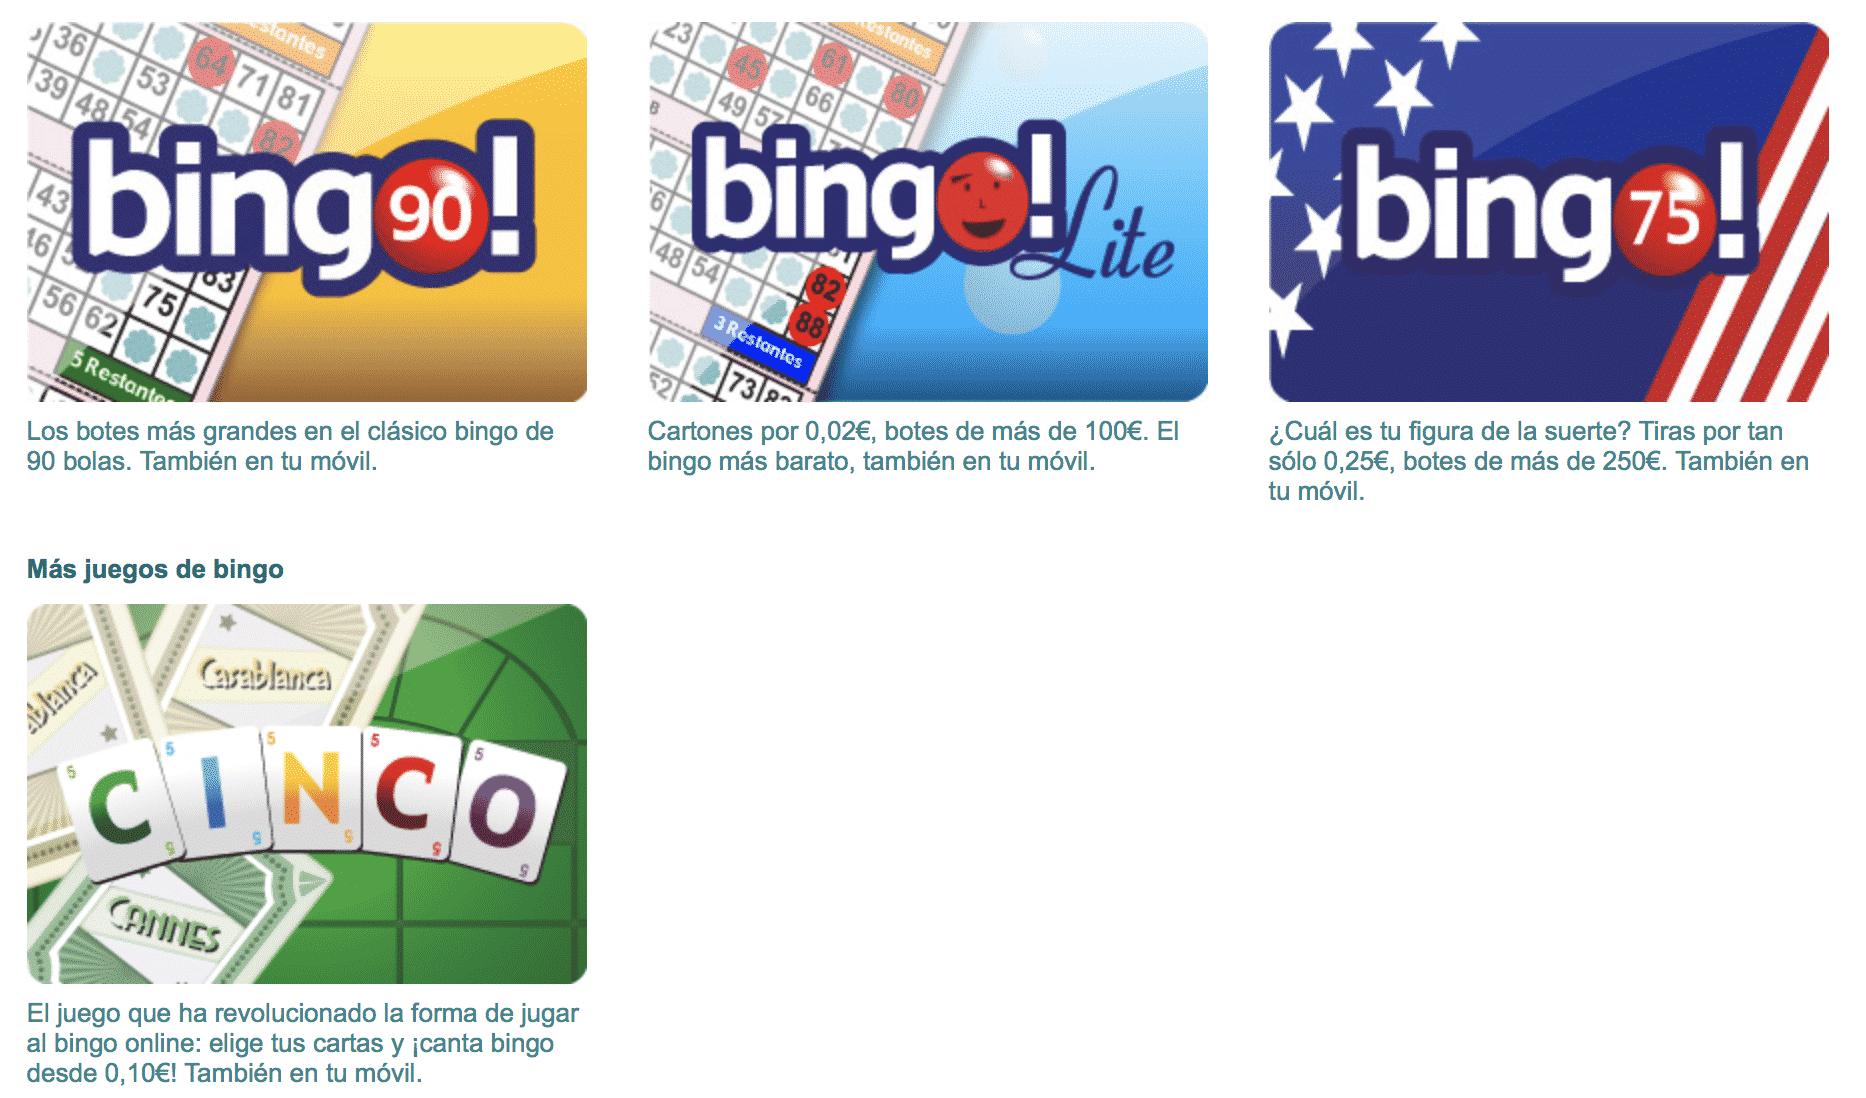 Bingo gratis sin deposito paysafecard por casino-255248